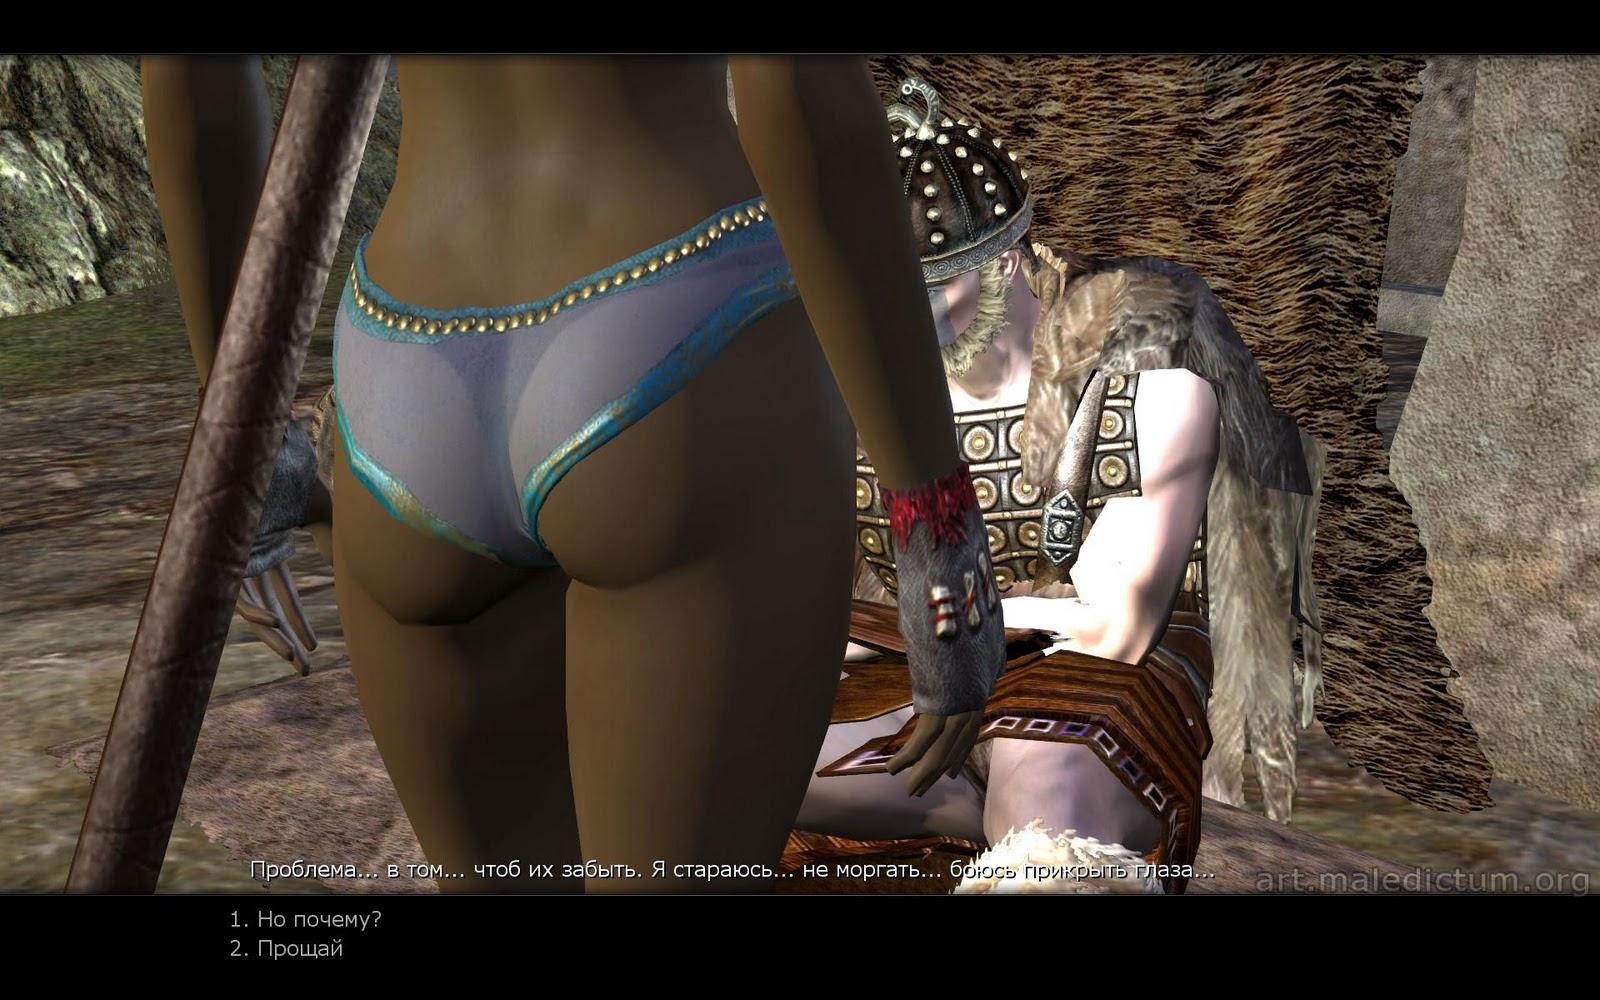 Age of conan BDSM the